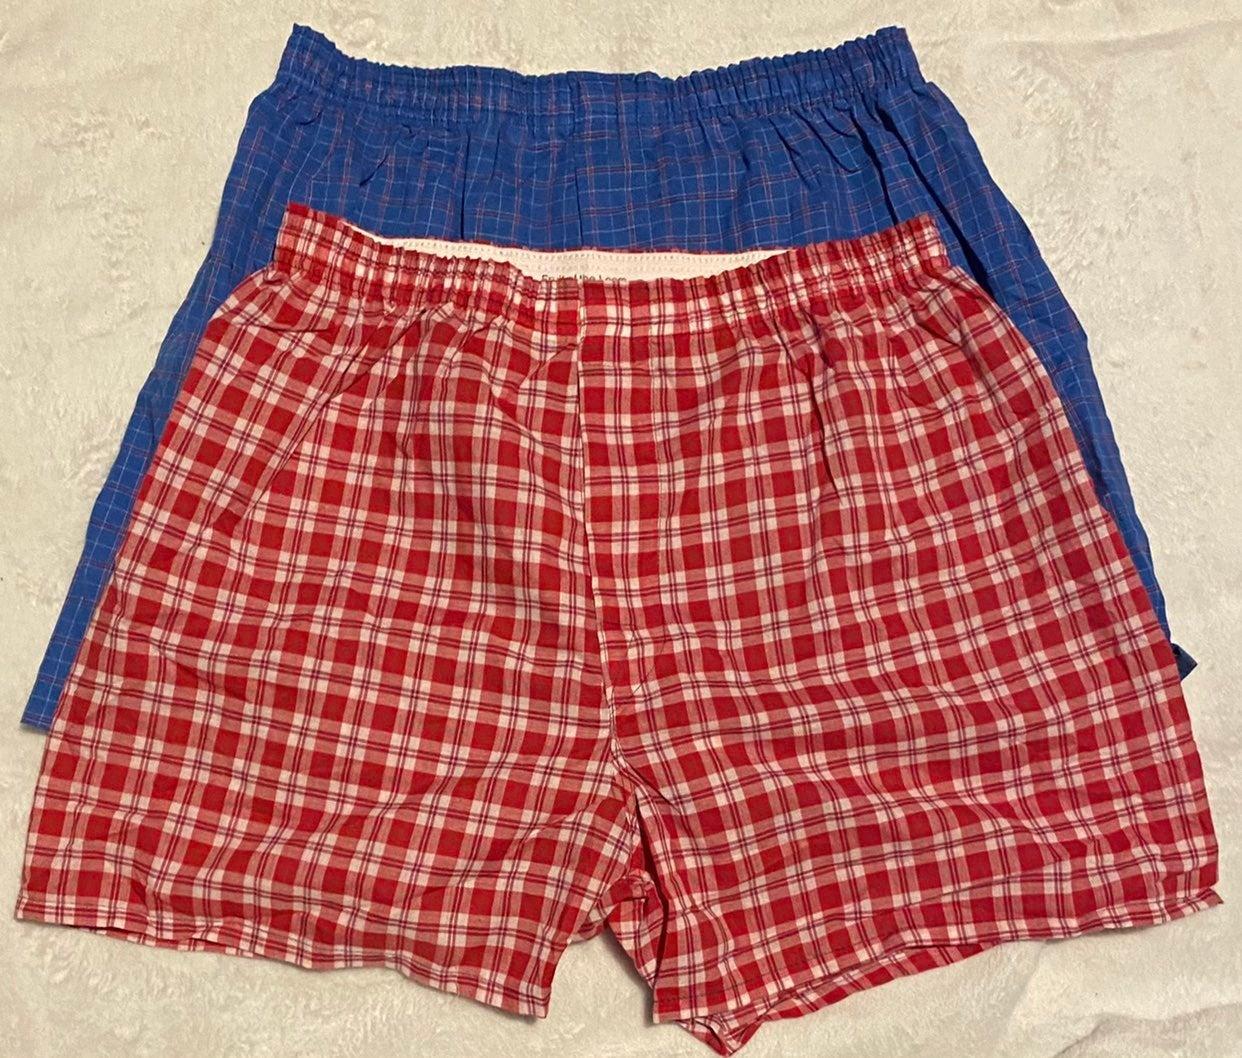 2 pair FOTL Boxer Shorts M 32-34 NEW